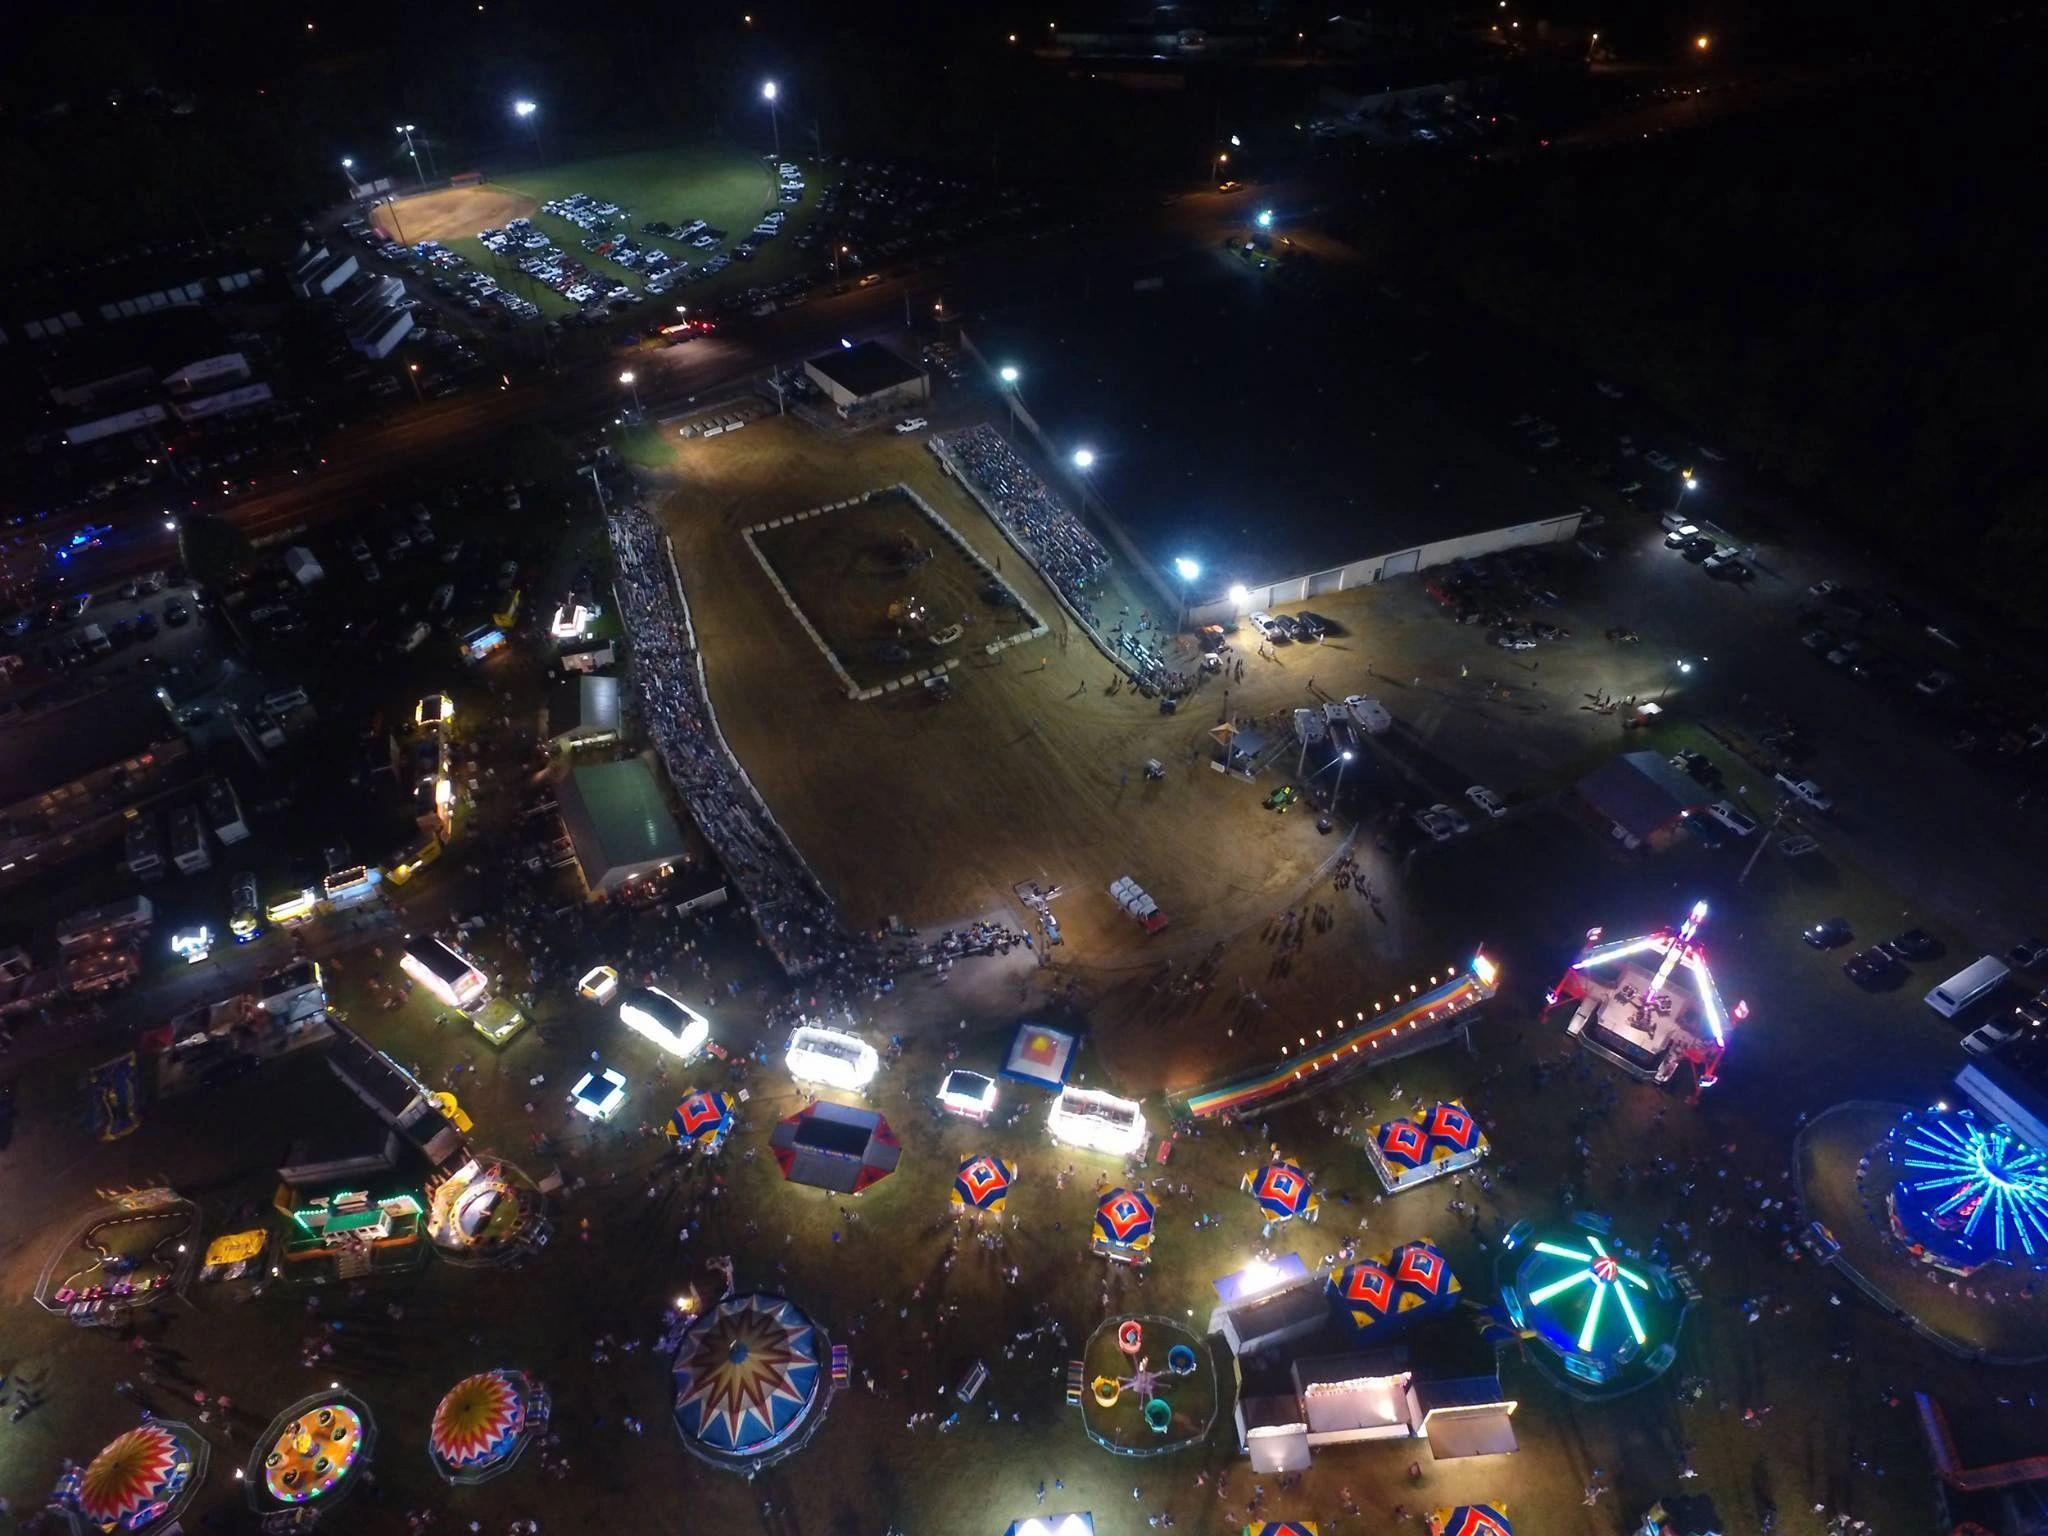 Robertson County Fair Association - Fairgrounds, Facility Rental